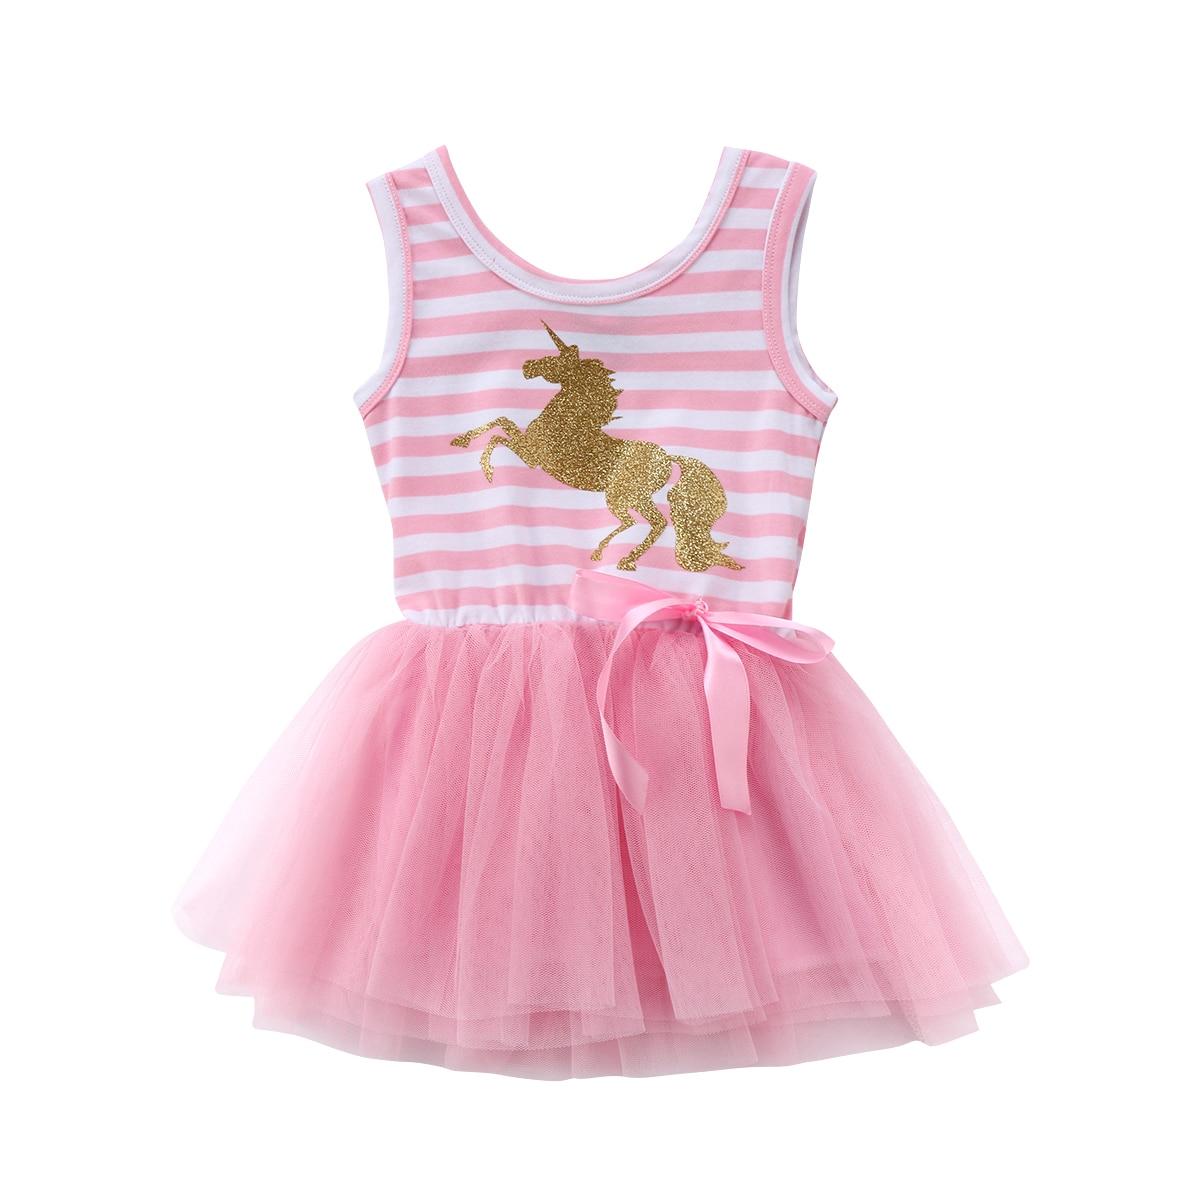 2018 pretty little girl baby unicorn dress summer